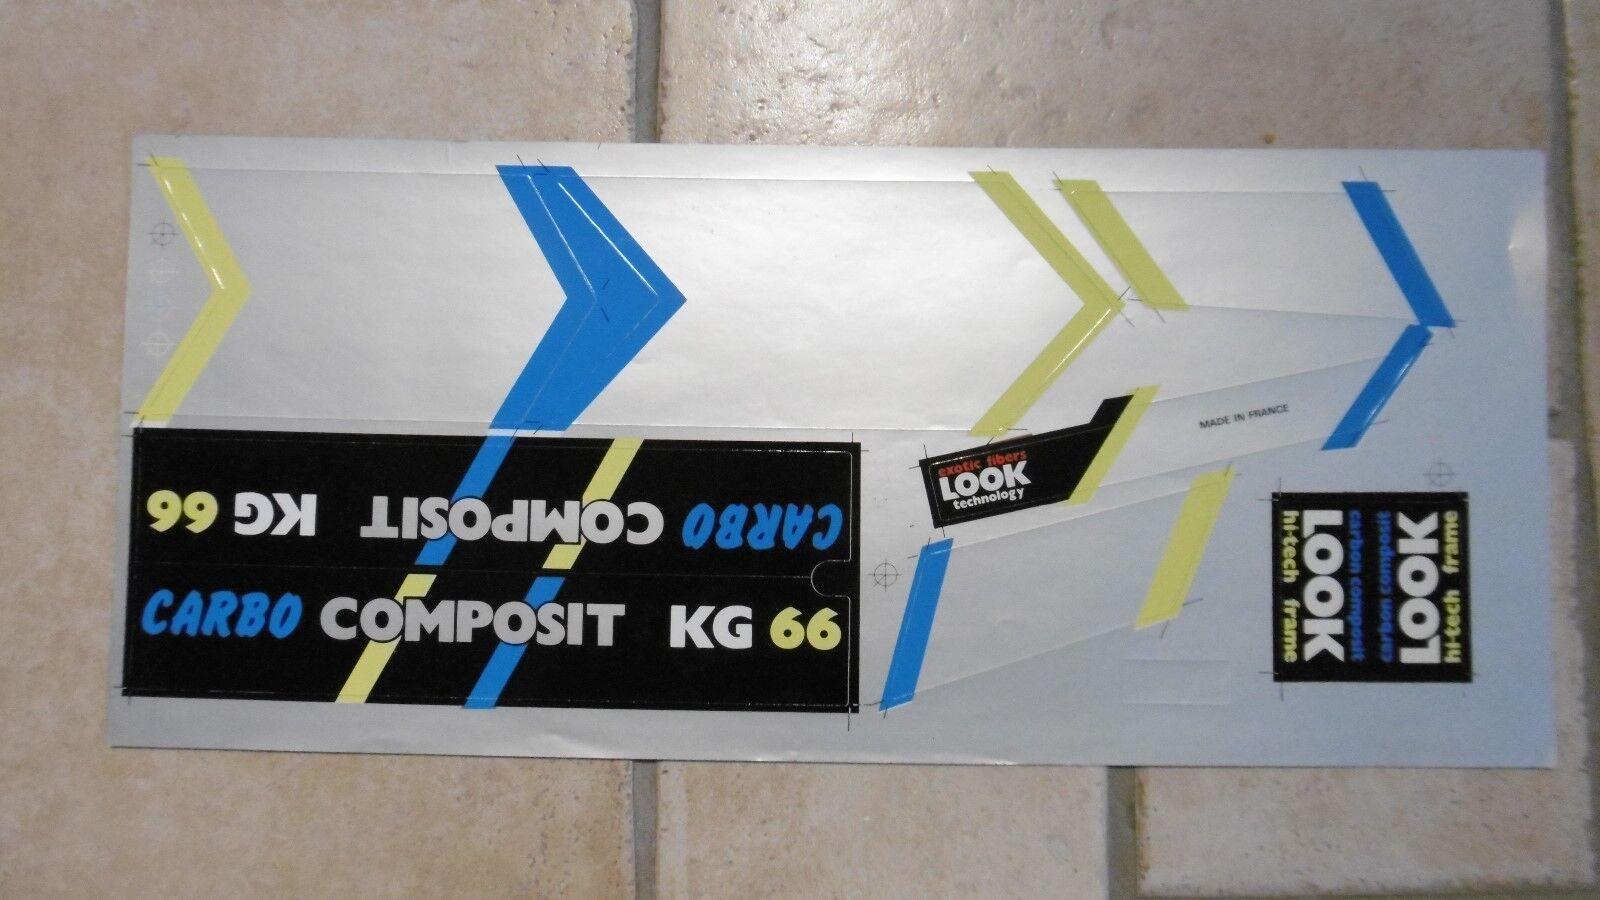 LOOK KG66 Carbo Composit Foil Decals Set